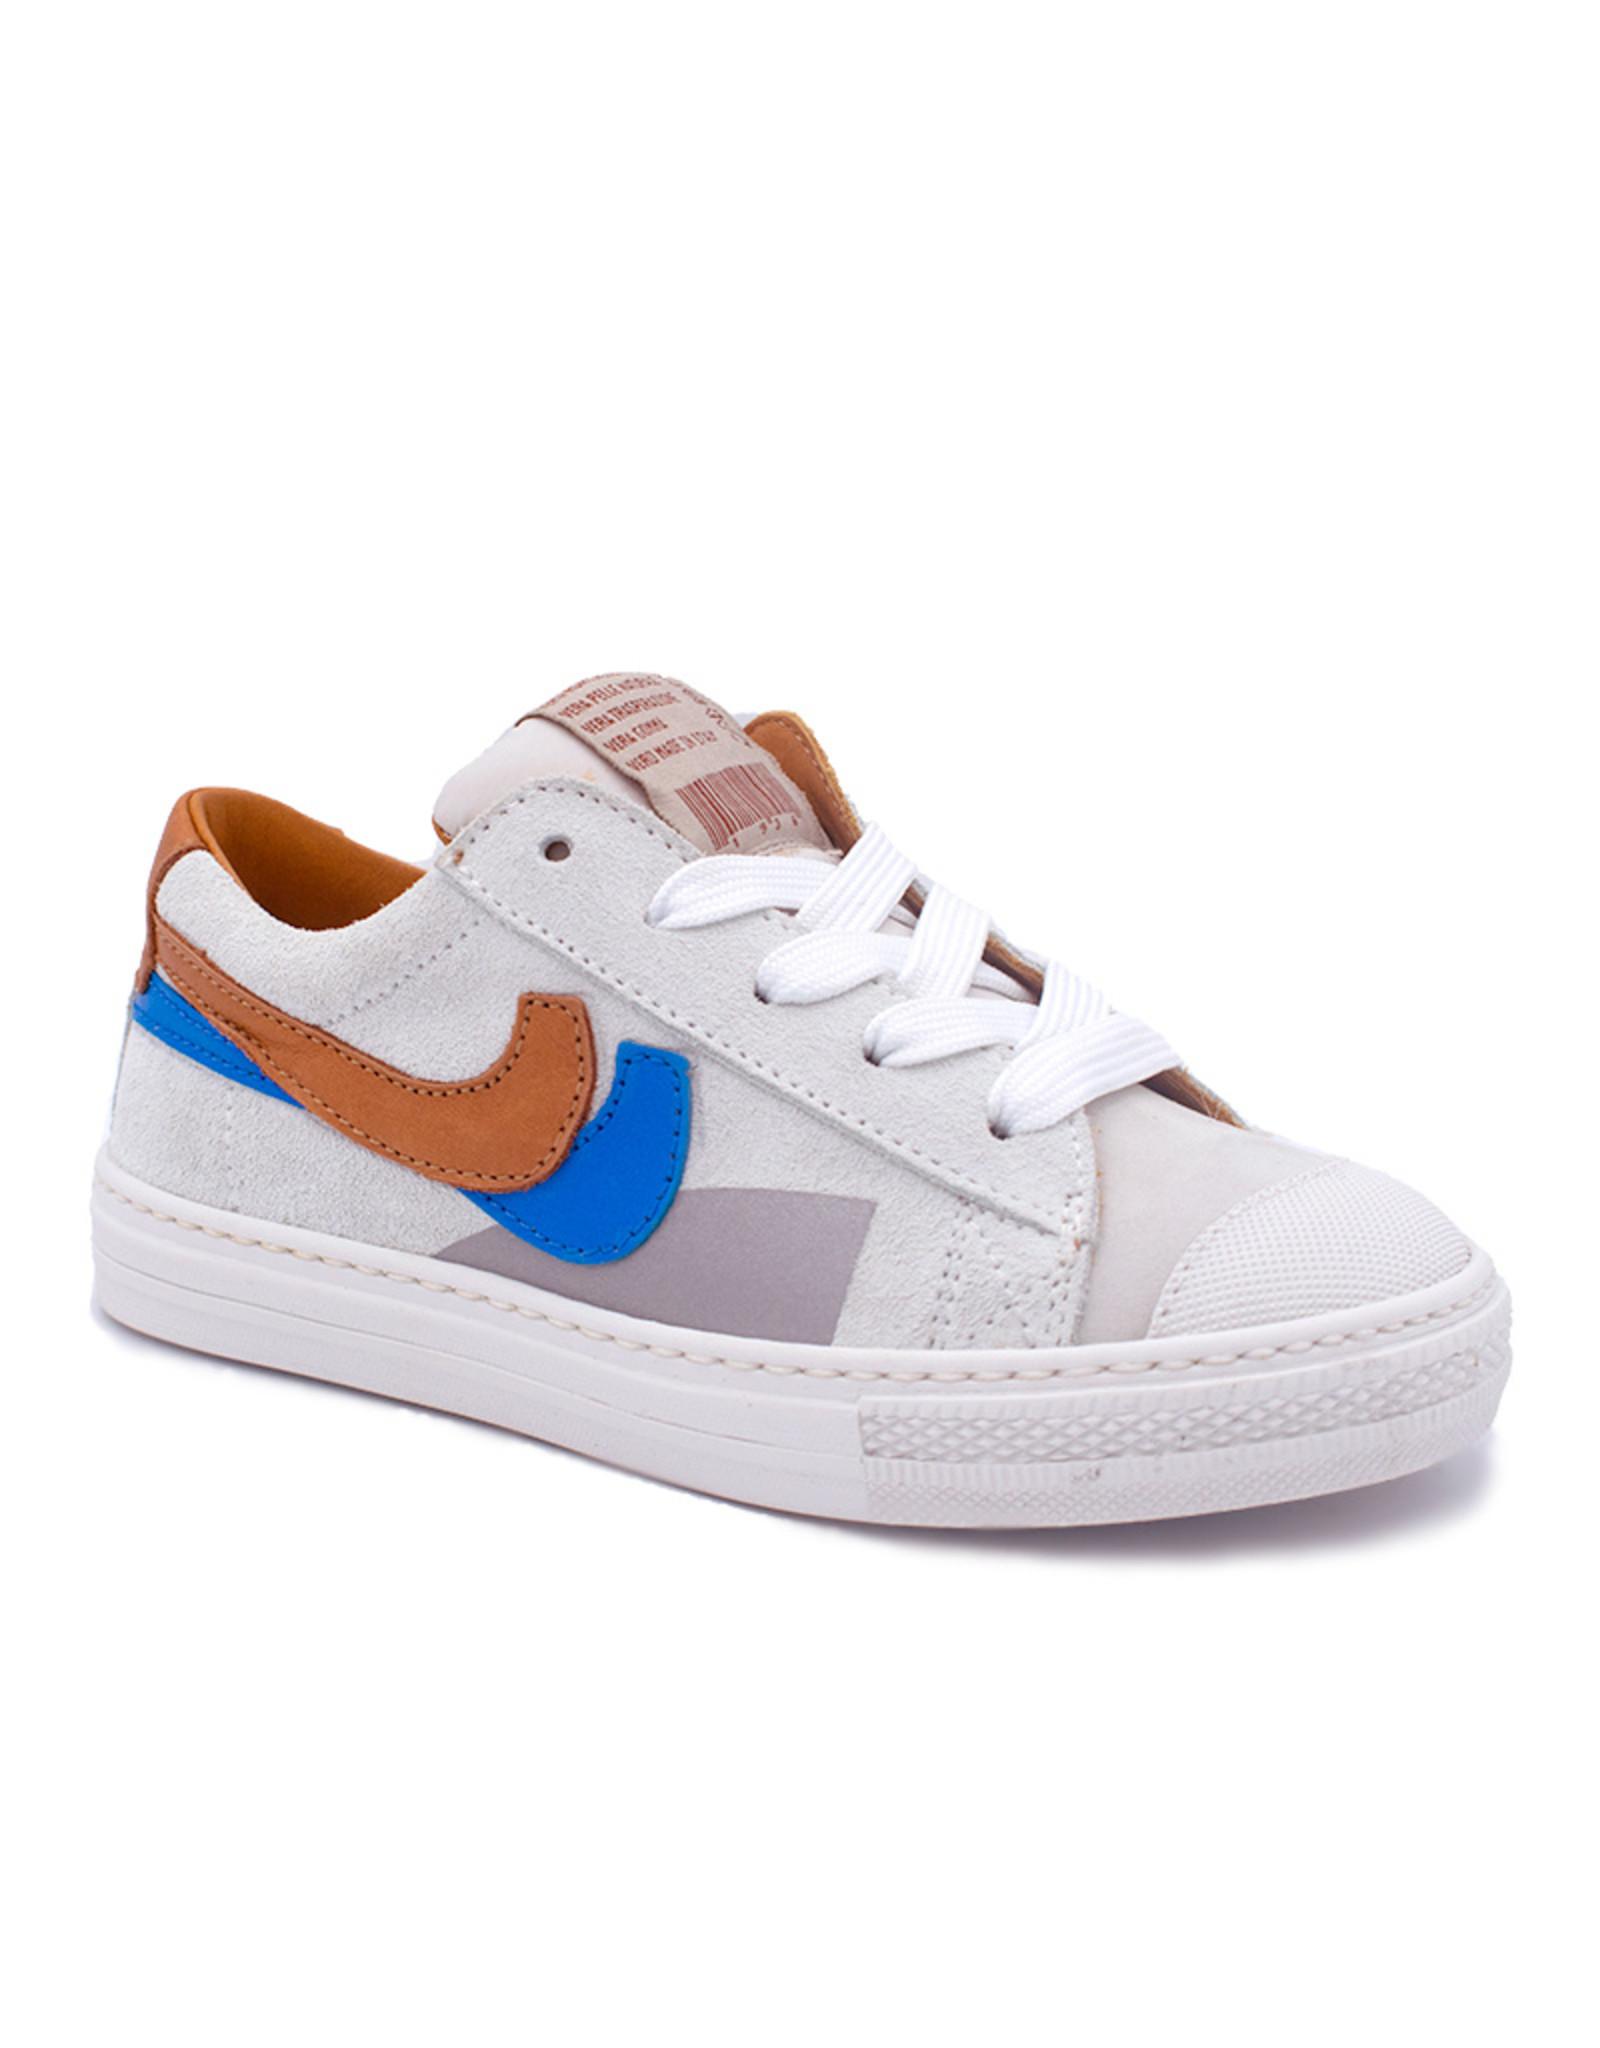 RONDINELLA RONDINELLA sneaker wit blauw bruin